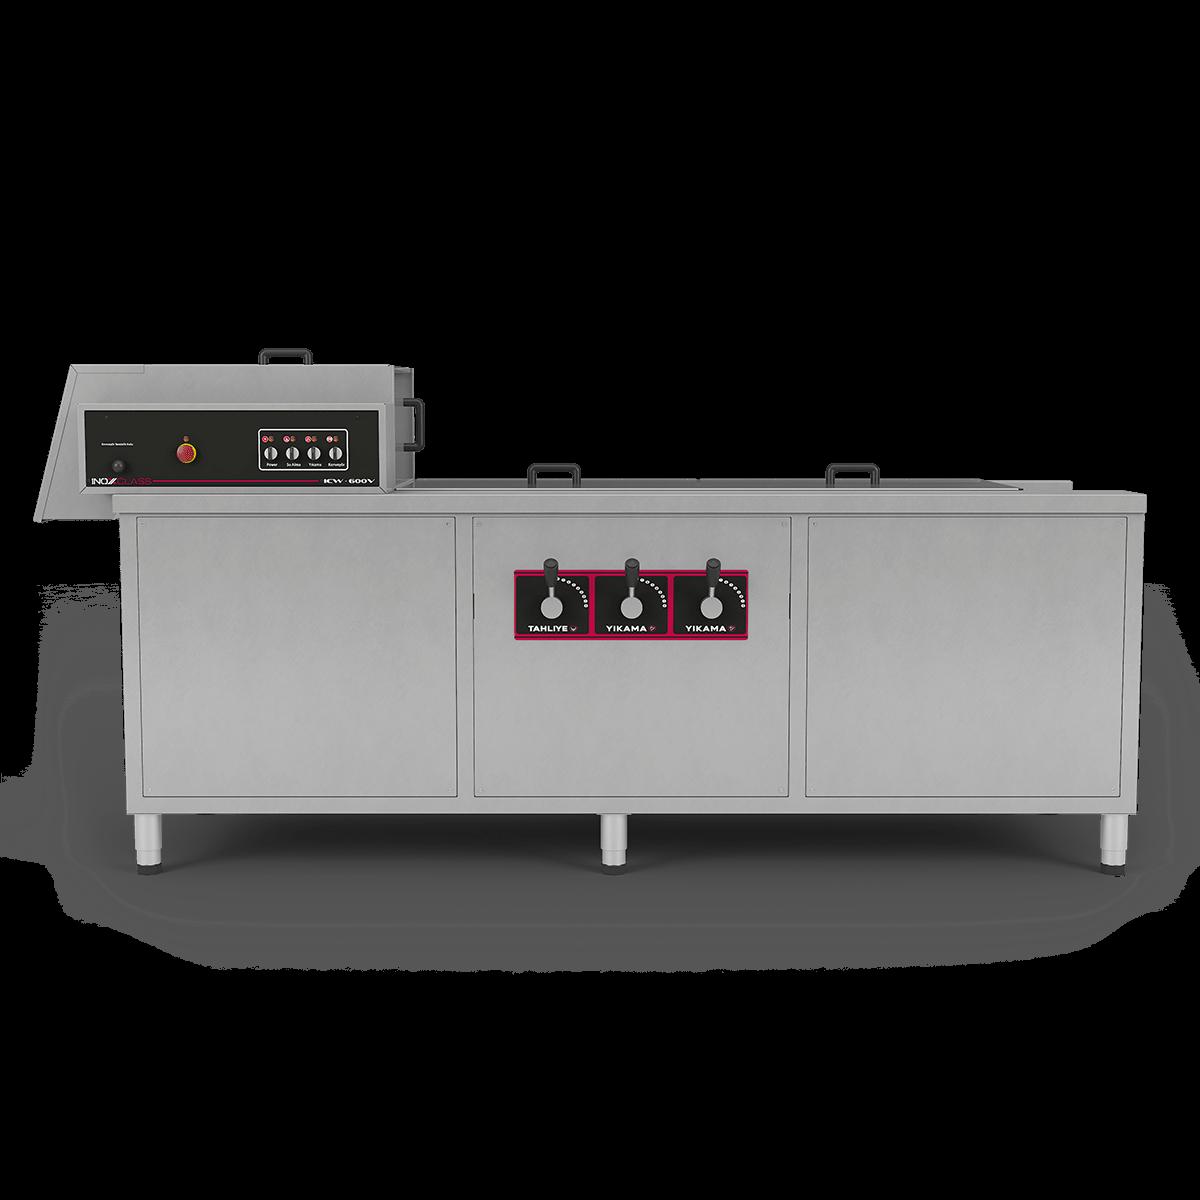 ICW-600V Sebze Yıkama Makinesi